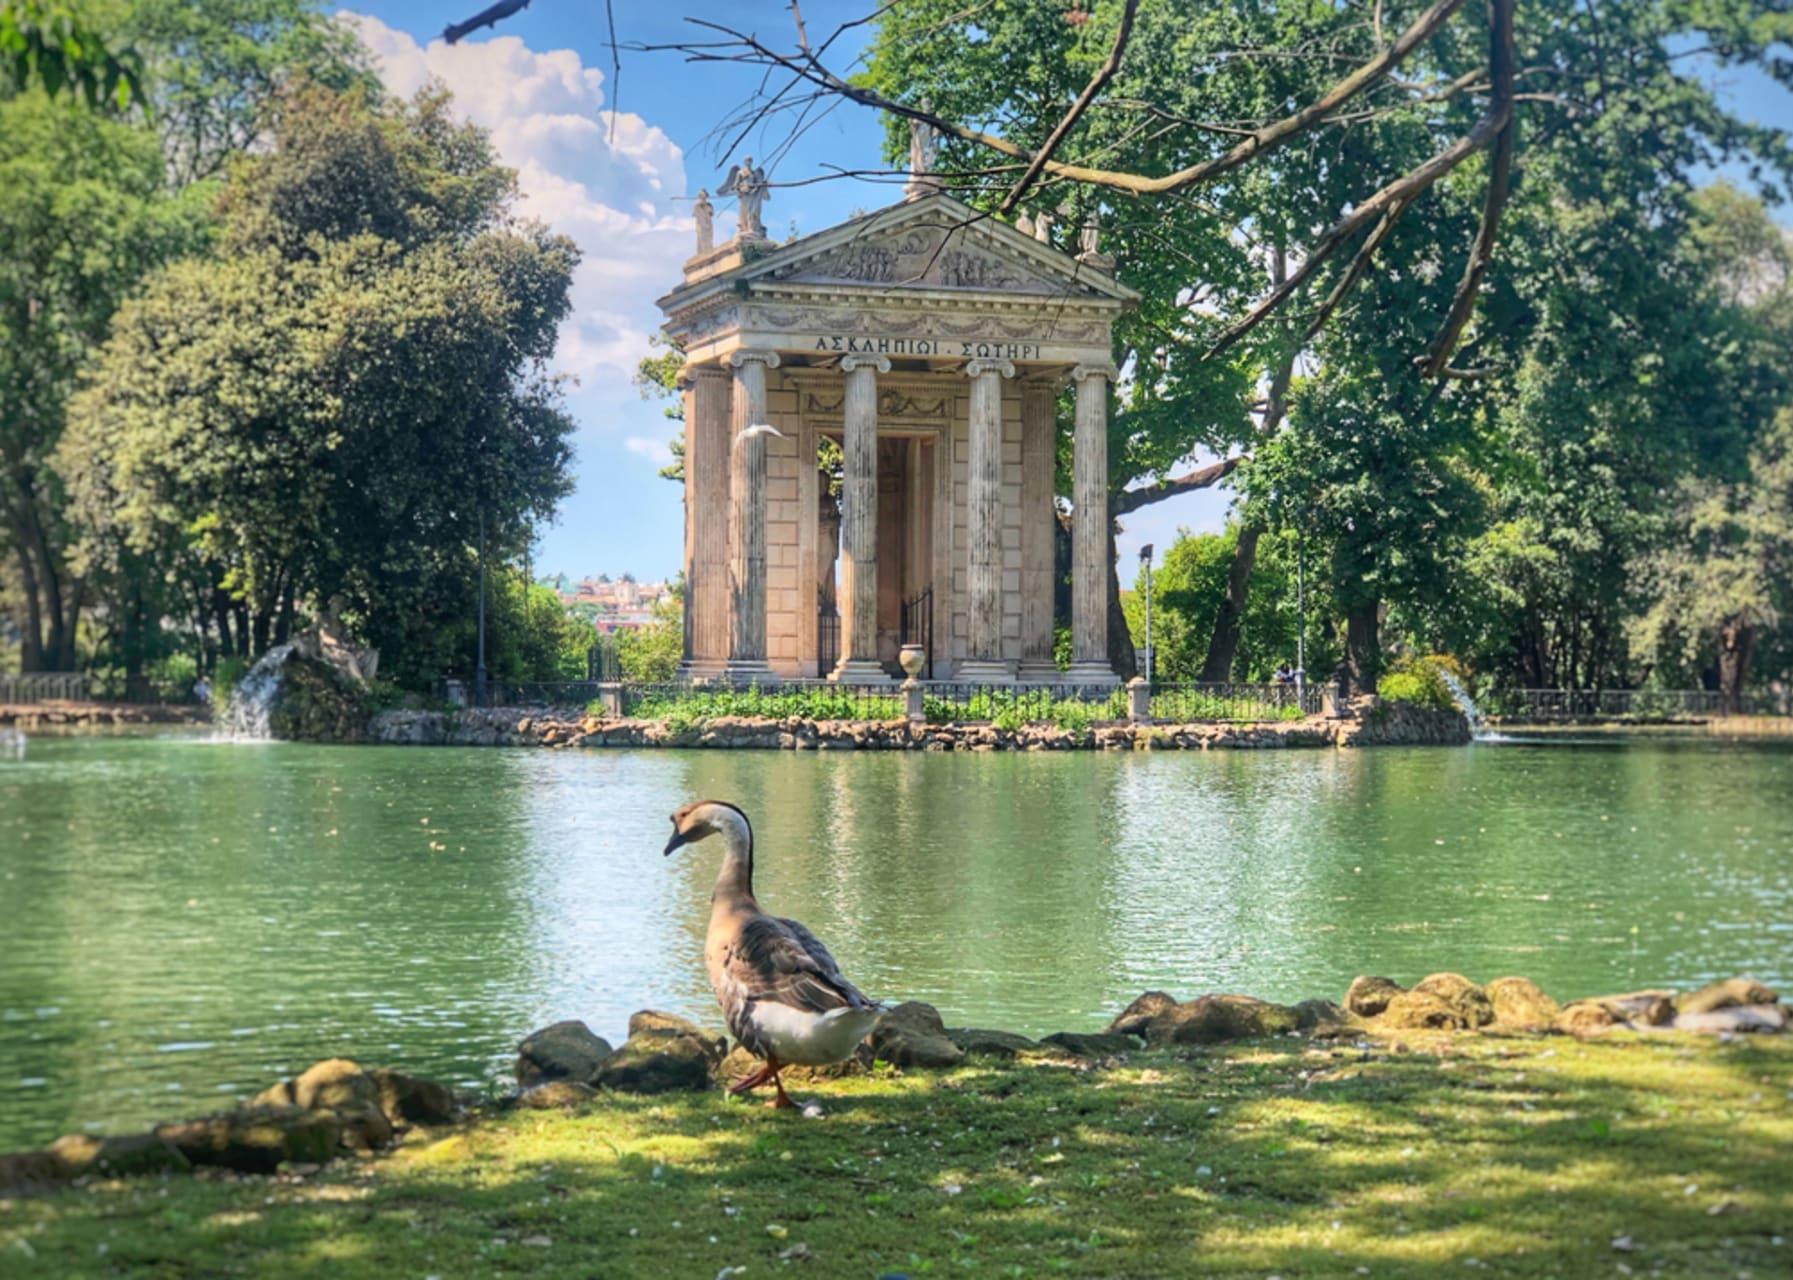 Rome - Villa Borghese - Part 2